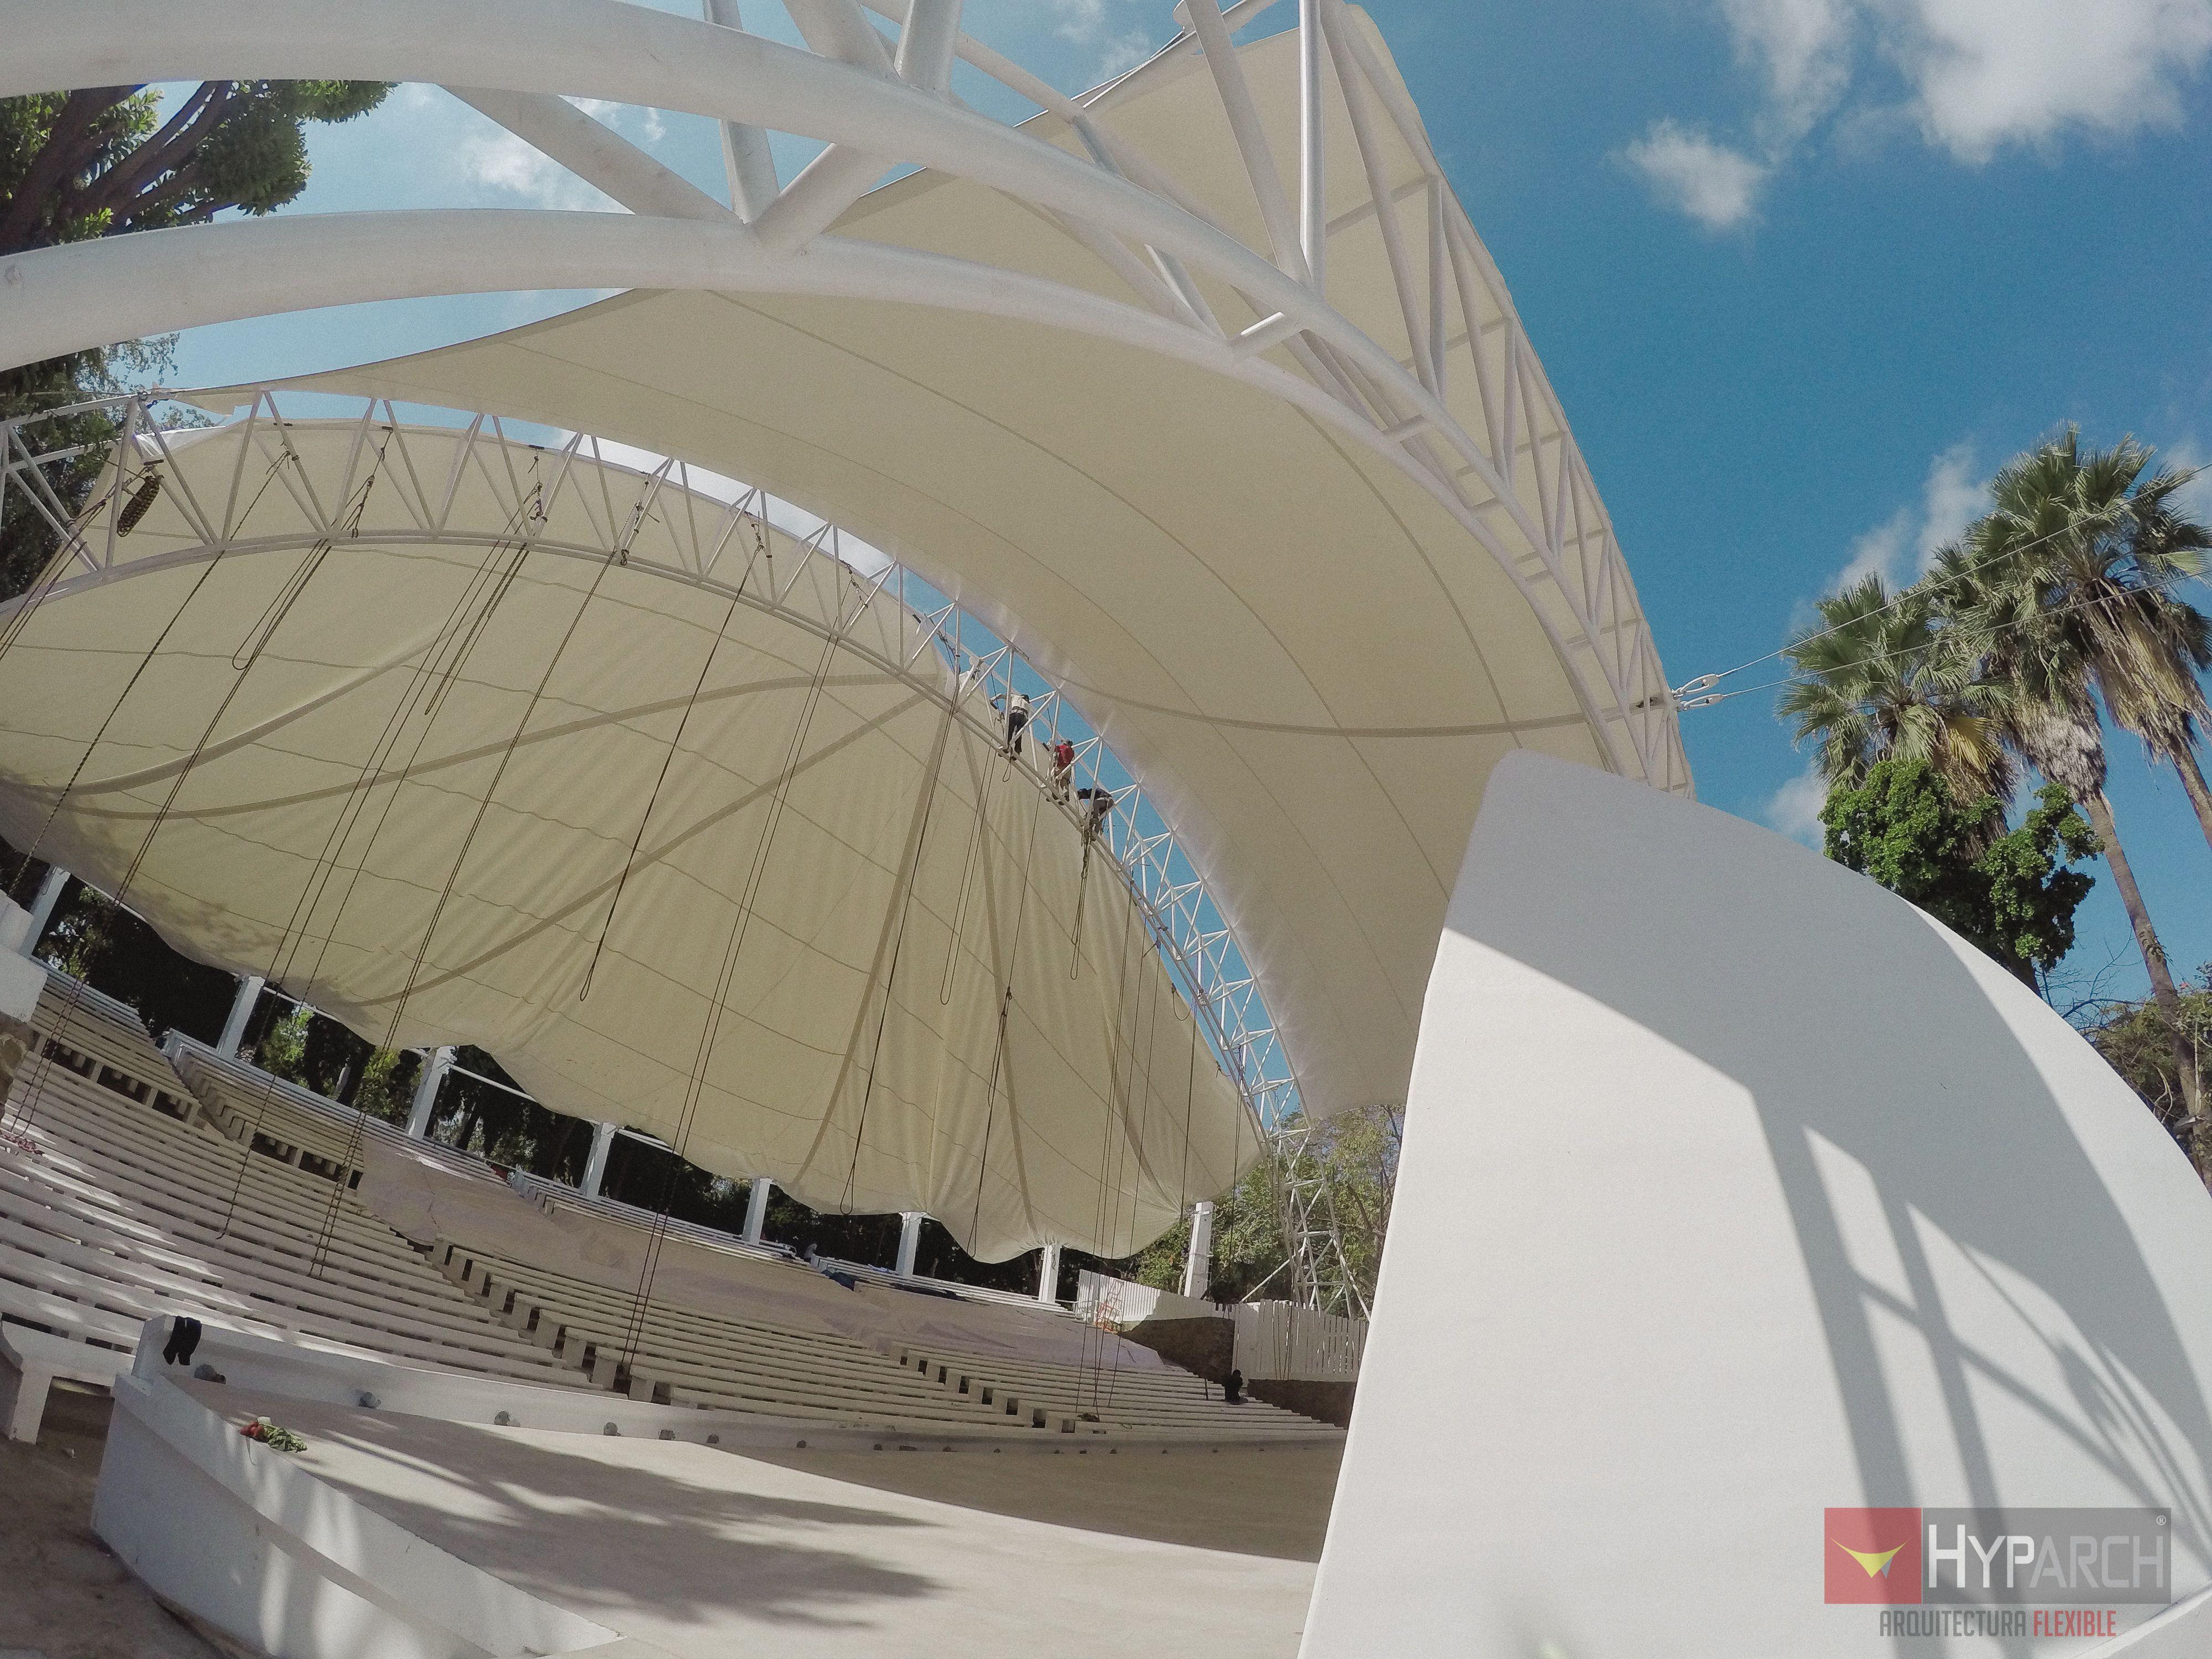 Velaria para auditorio en Culiacán #arquitectura #construccion ...